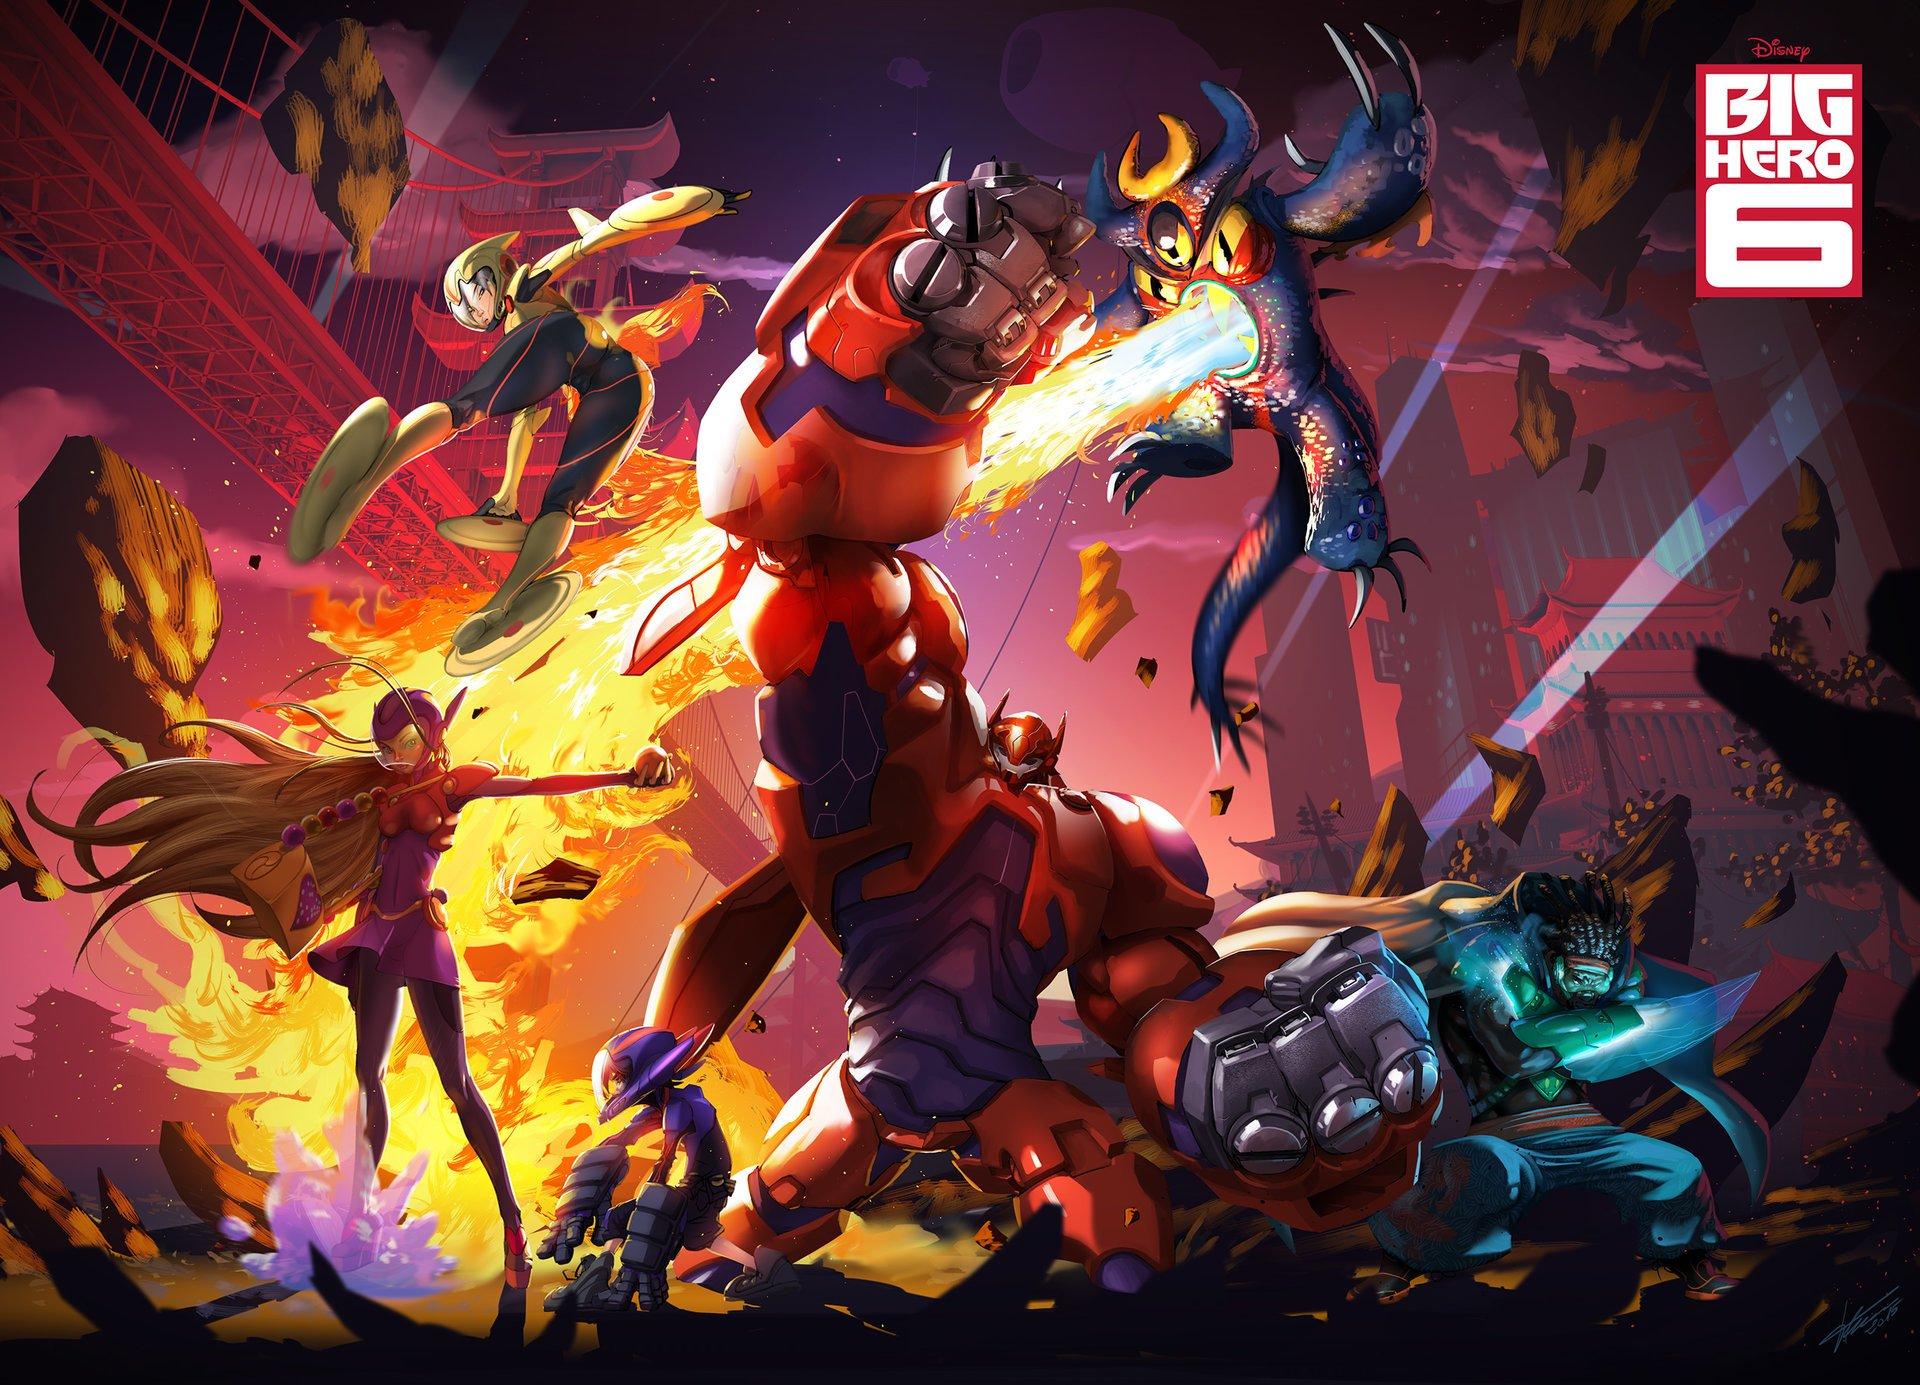 Hd wallpaper hero - Hd Wallpaper Background Id 570354